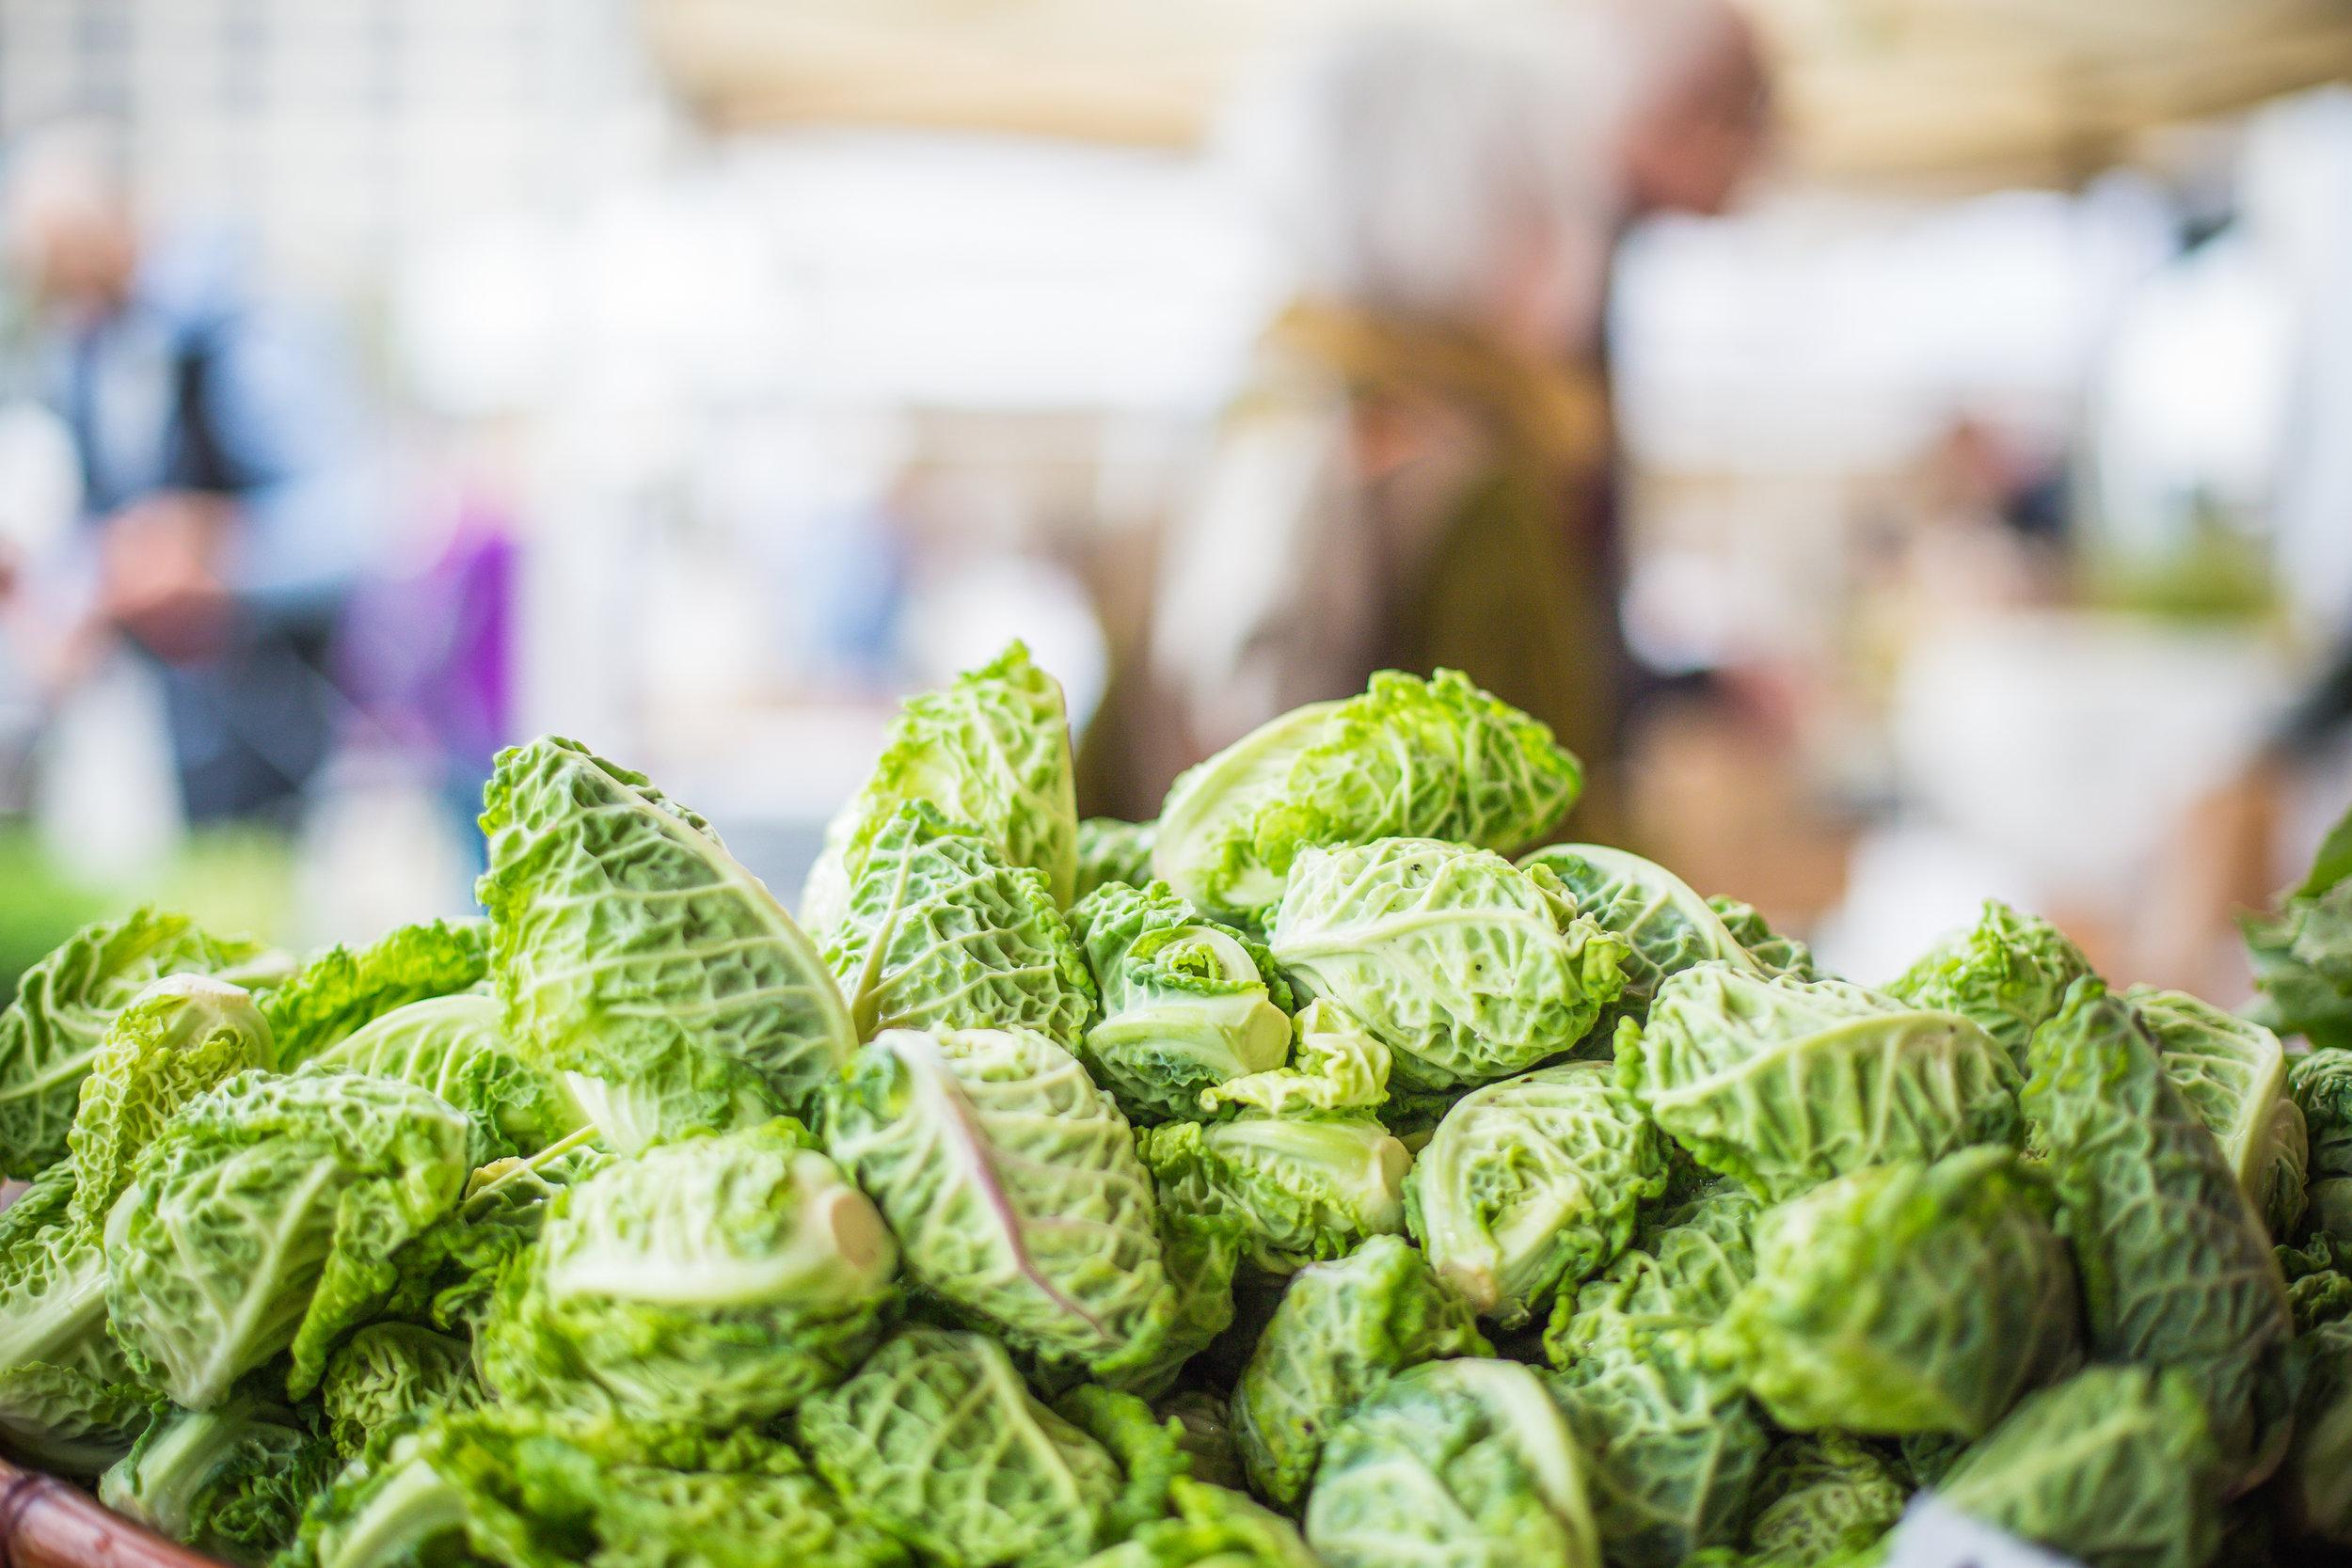 fresh-and-healthy-veggies-at-farmers-market-picjumbo-com.jpg